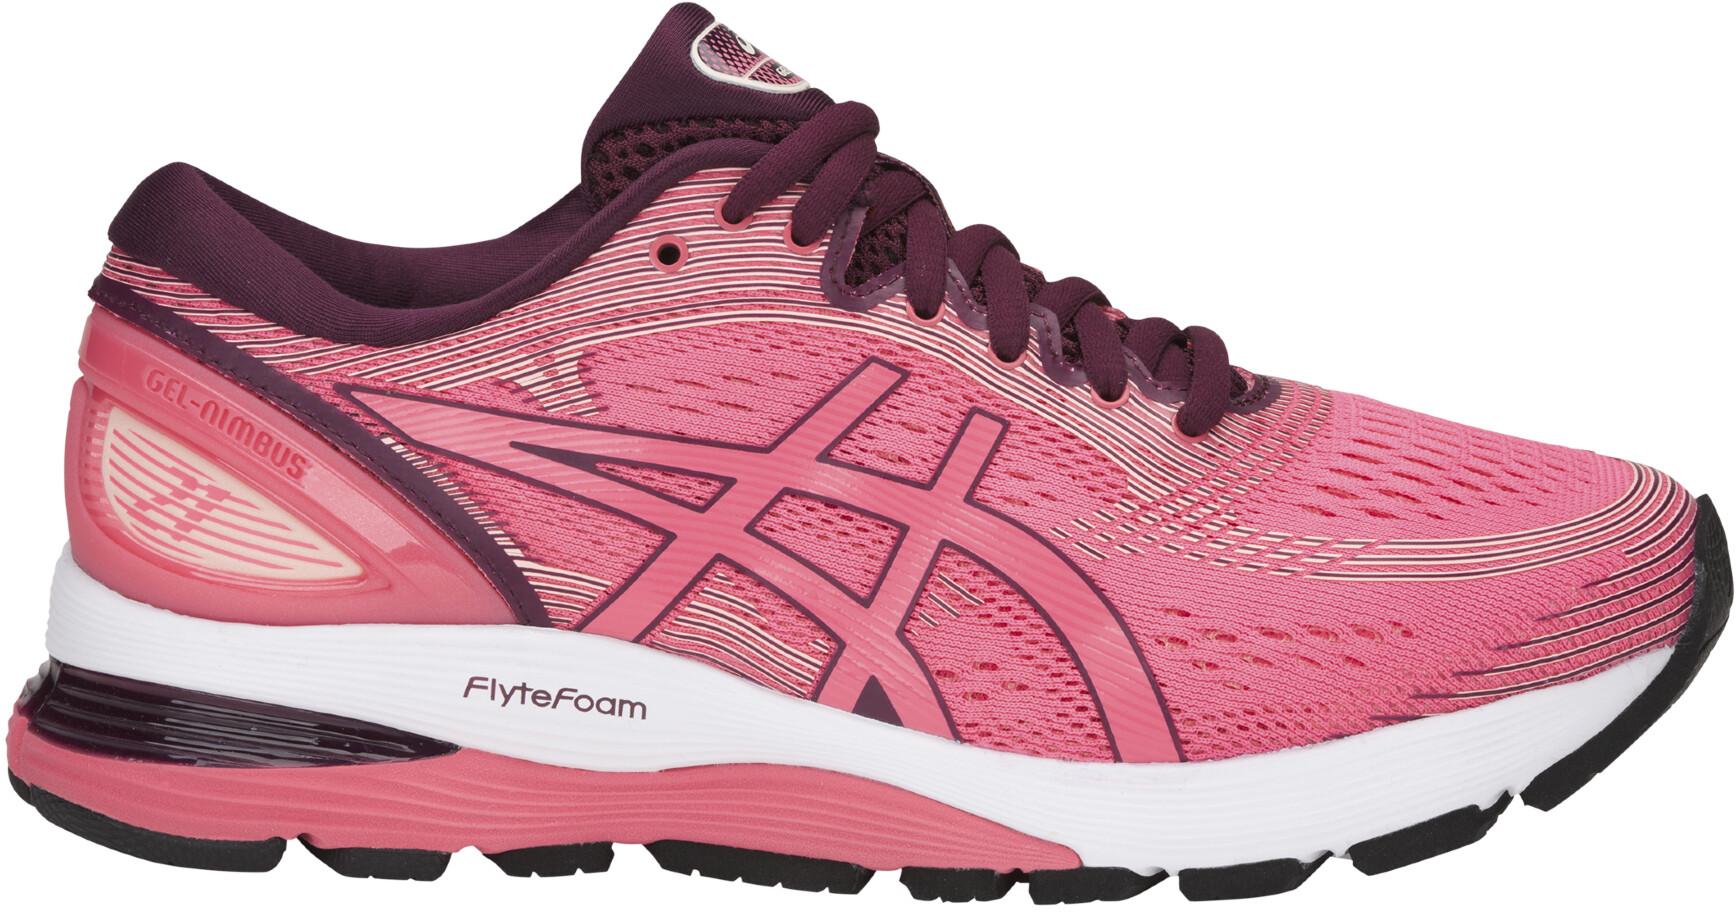 188b02f61aac asics Gel-Nimbus 21 Running Shoes Women pink at Addnature.co.uk